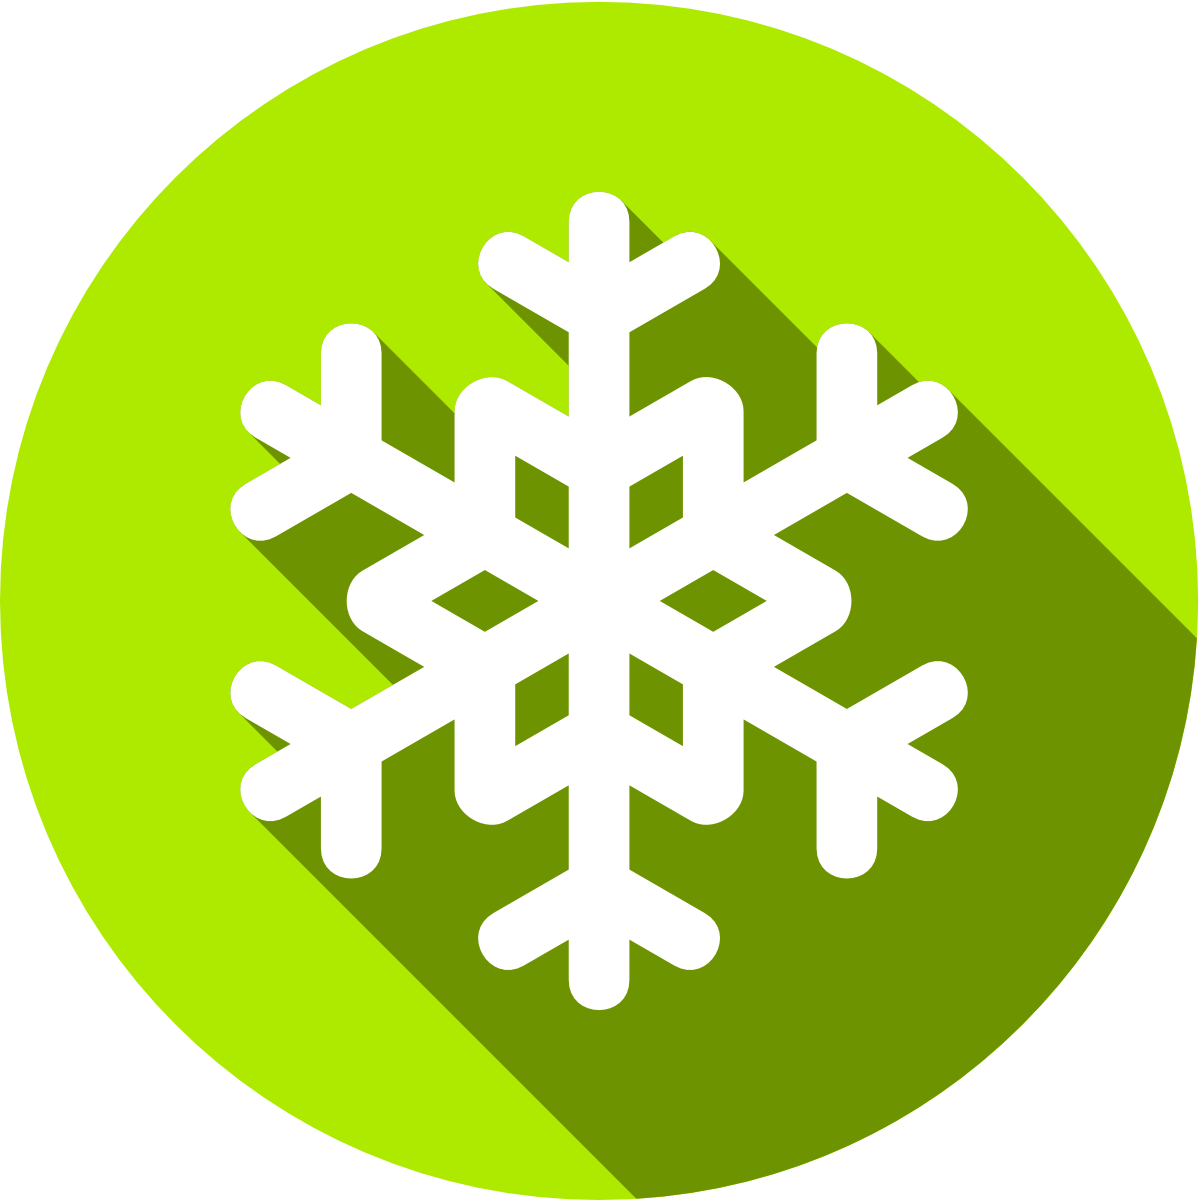 Shopify Snow Effects app by Secretbakery.io